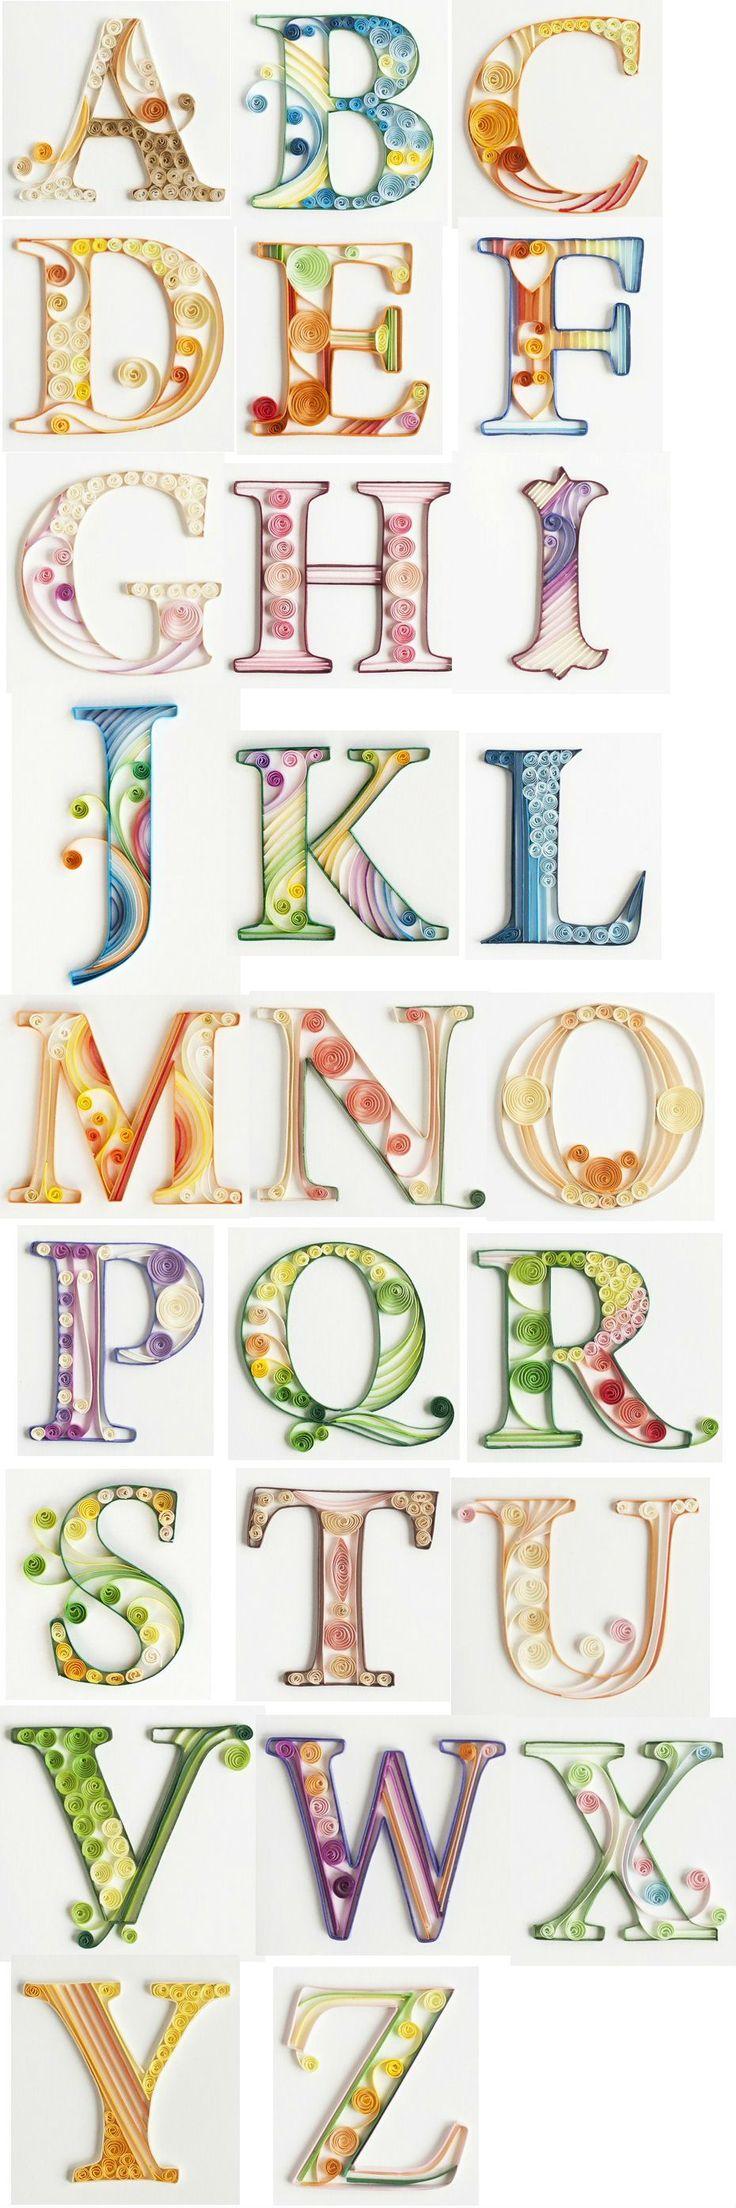 alfabeto artistico